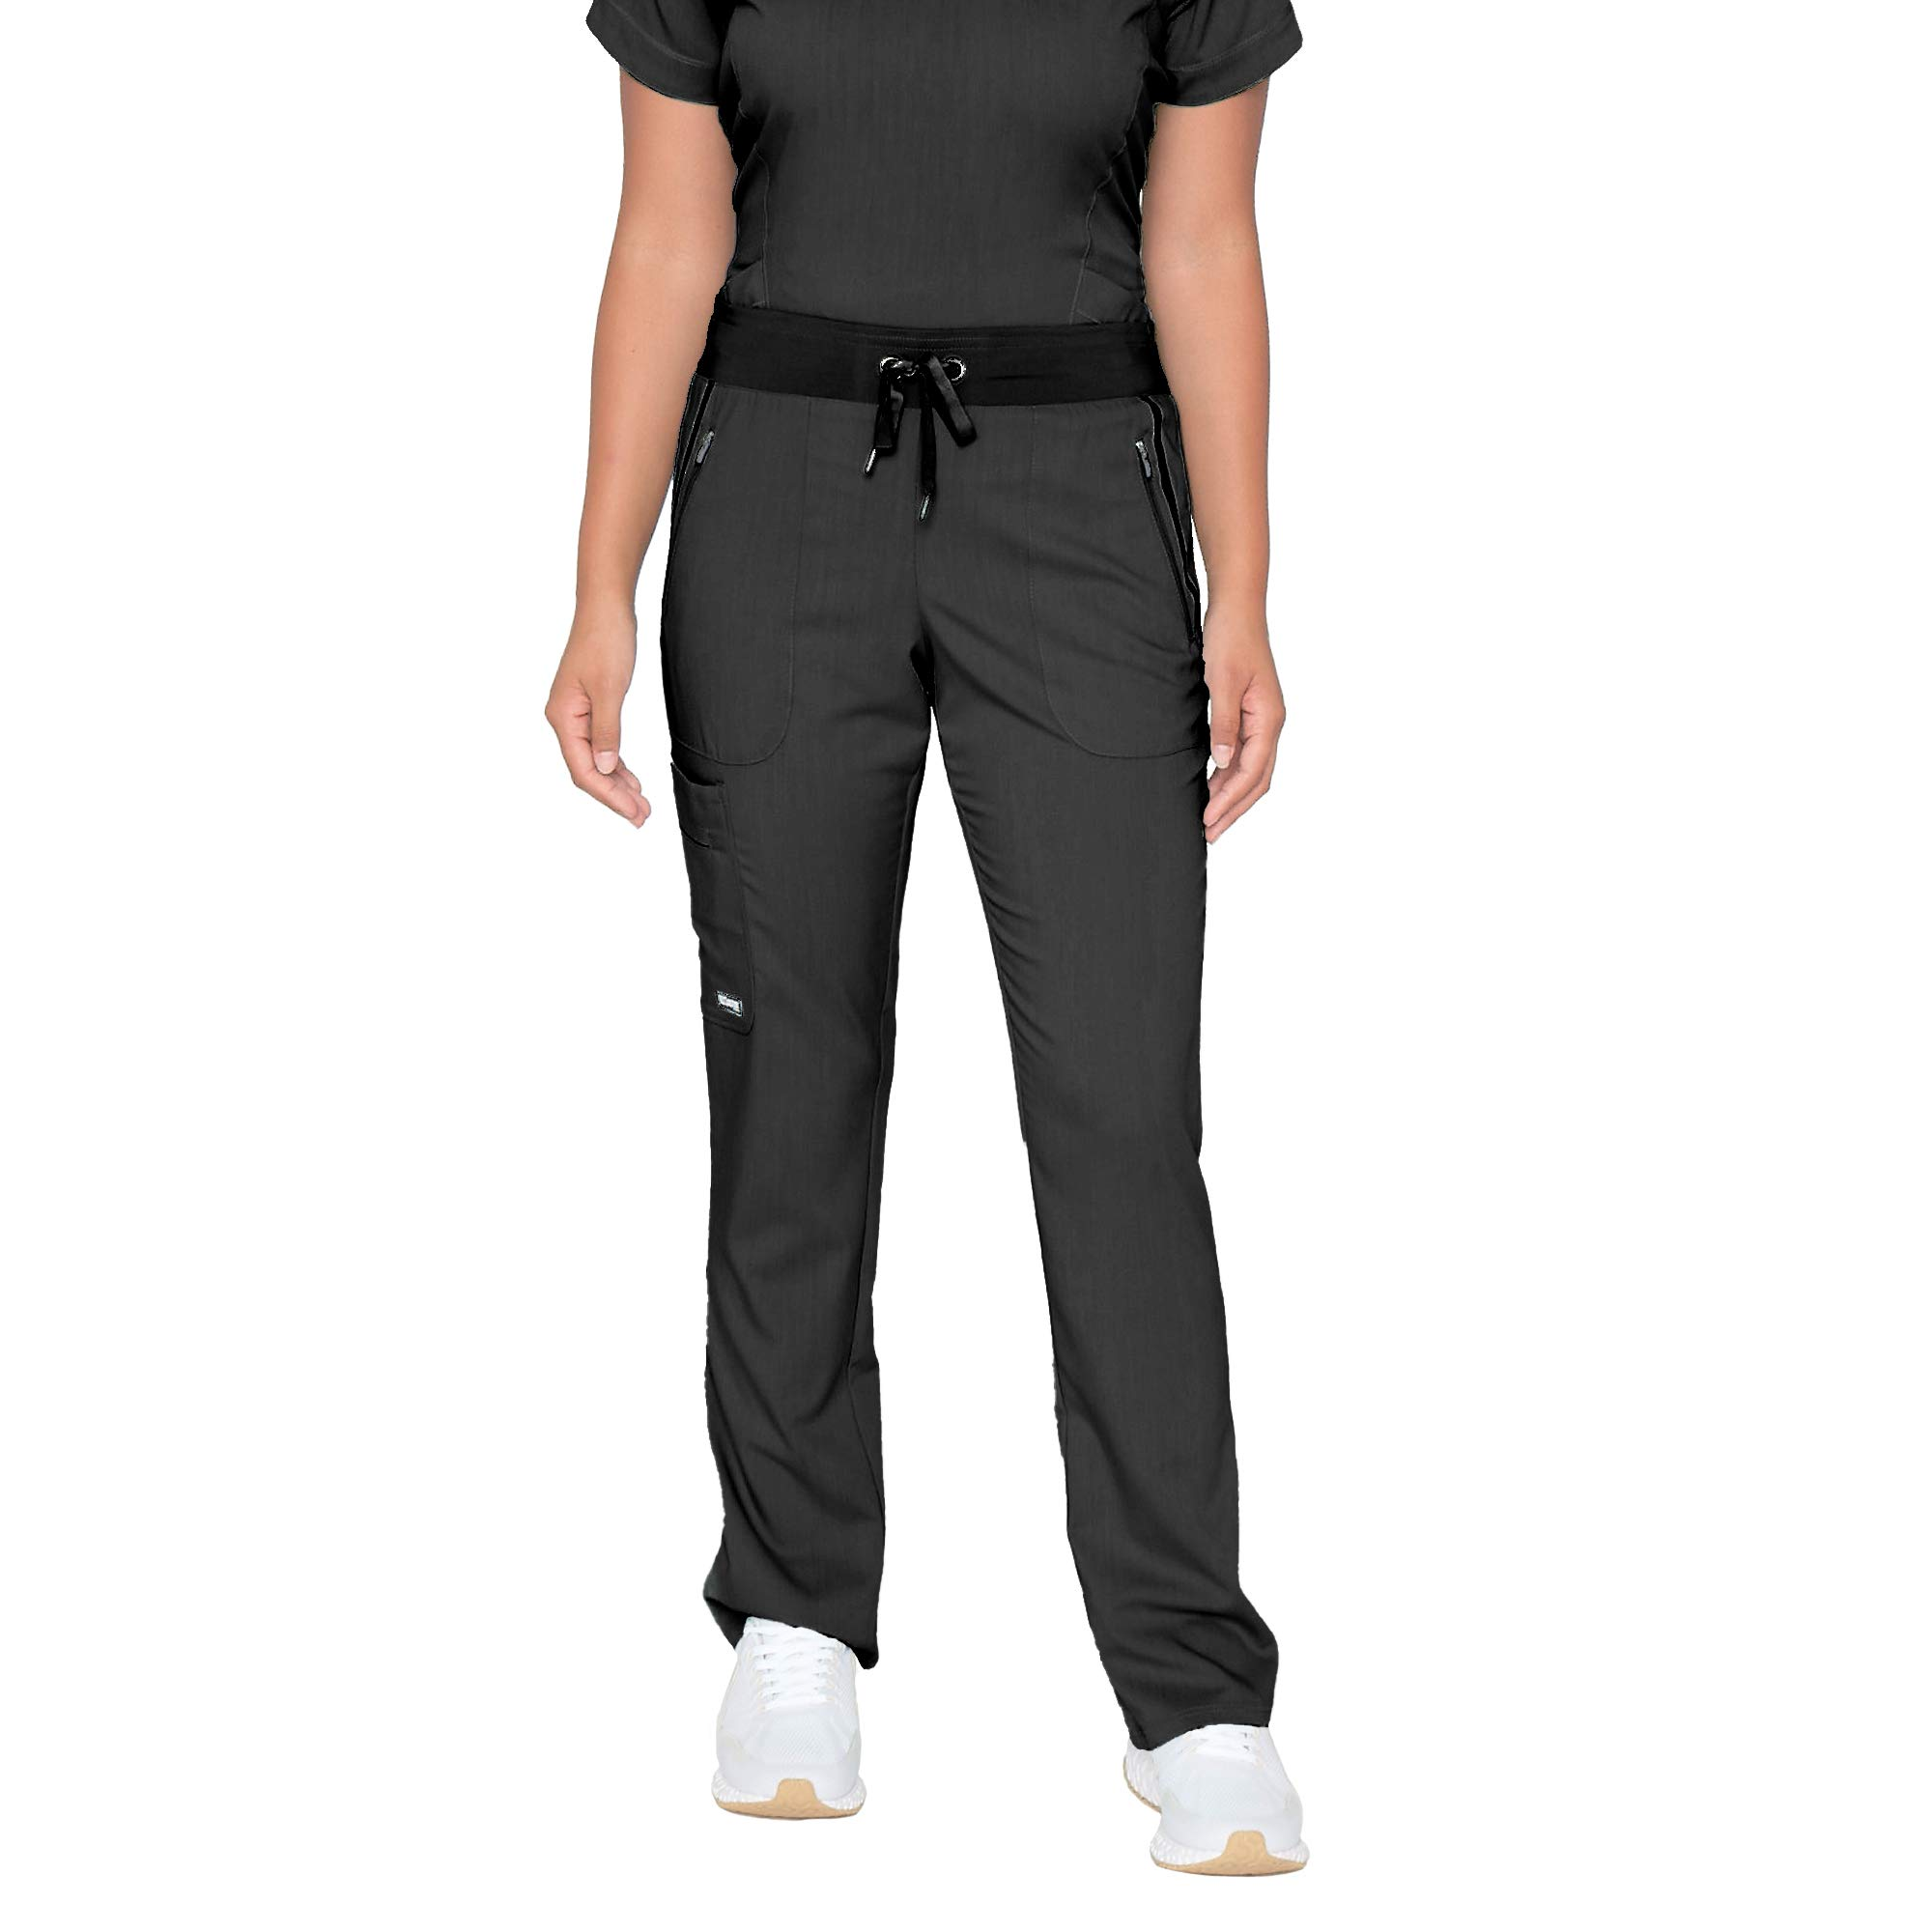 BARCO Grey's Anatomy Impact Women's Elevate Pant, Medical Scrub Pant w/Spandex Stretch & 6 Pockets